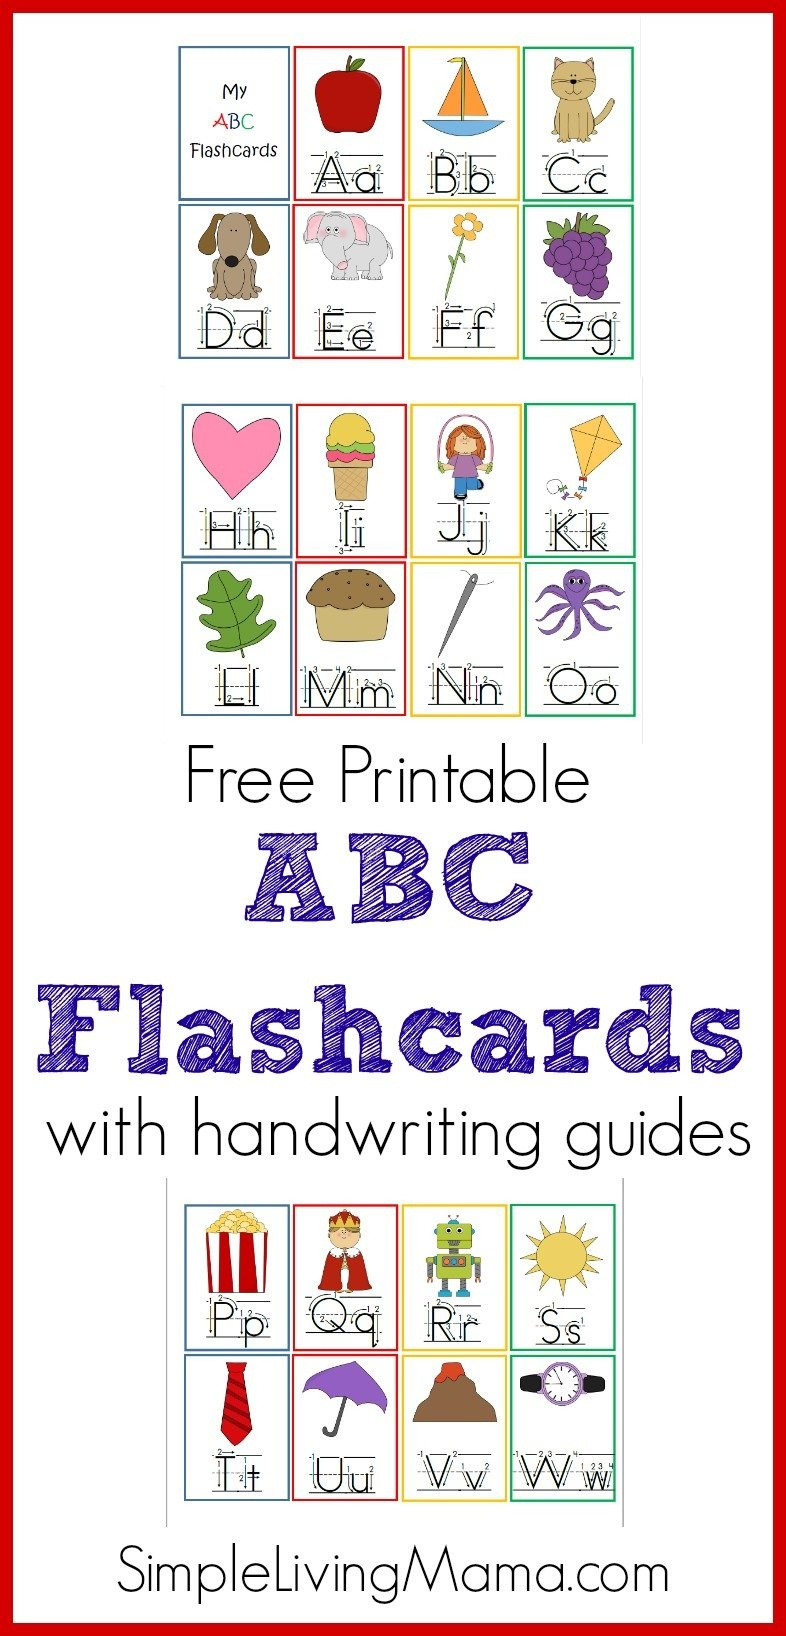 Preschool Abc Flashcards - Homeschool Printables For Free - Free Printable Abc Flashcards With Pictures